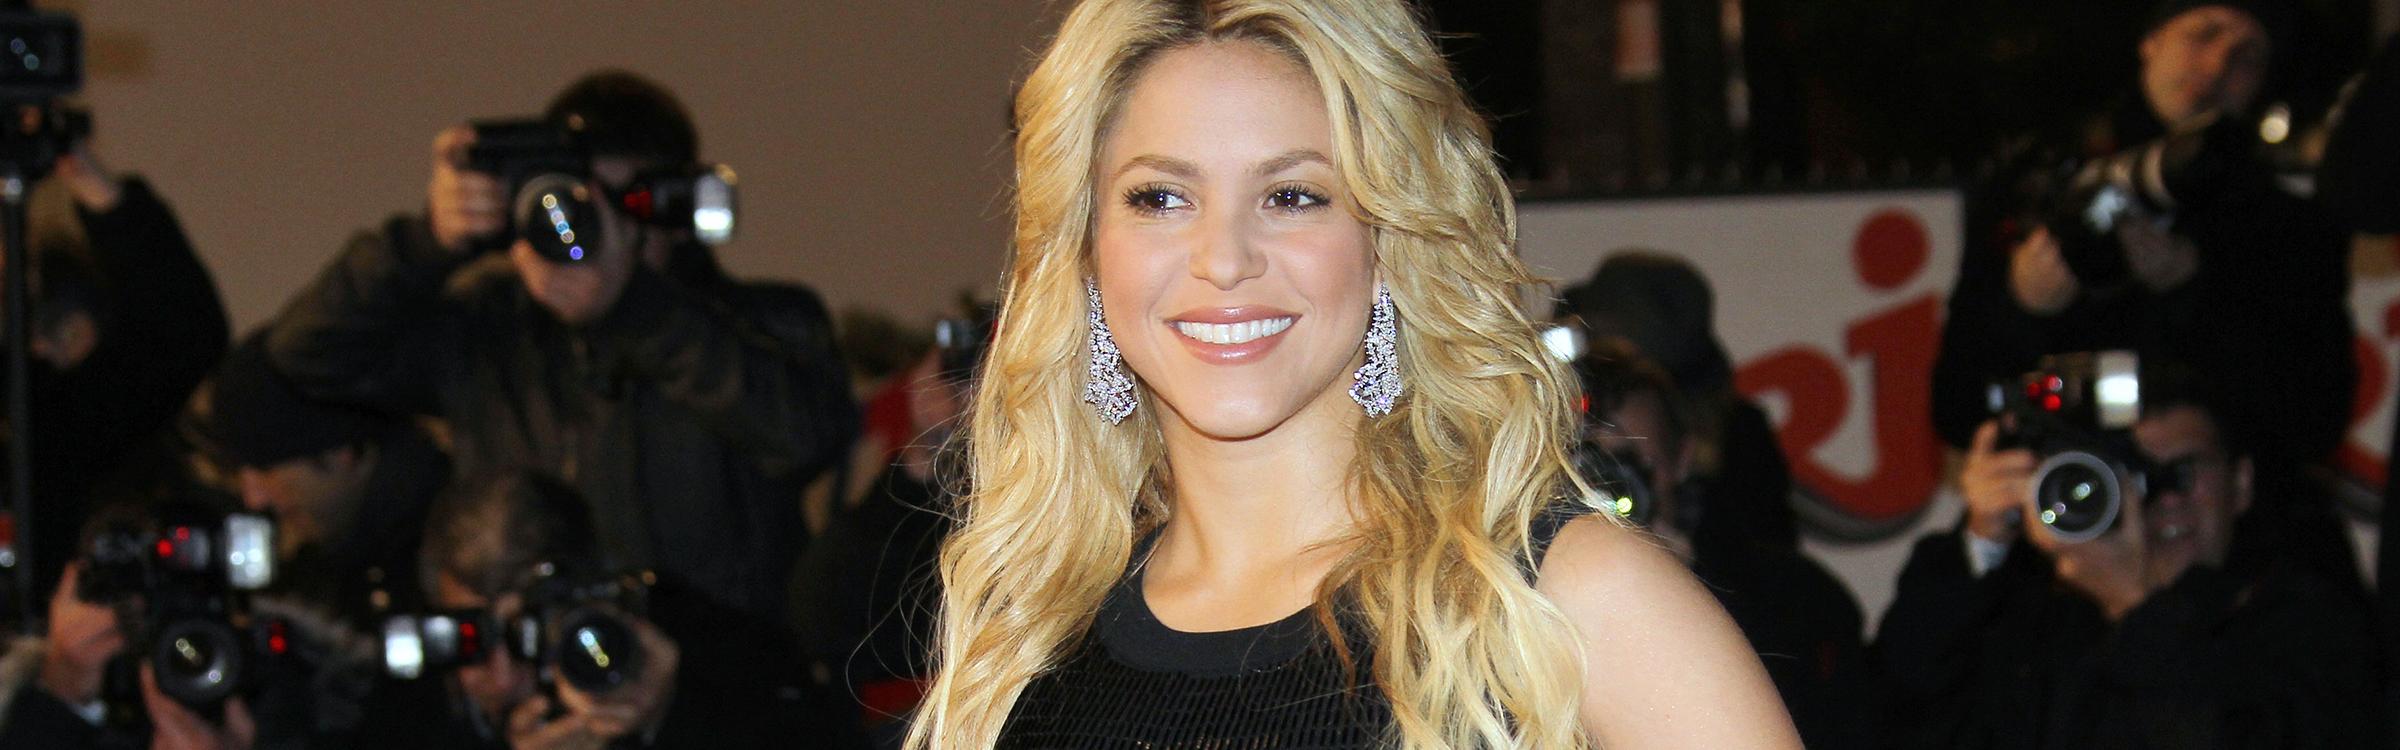 Shakirah